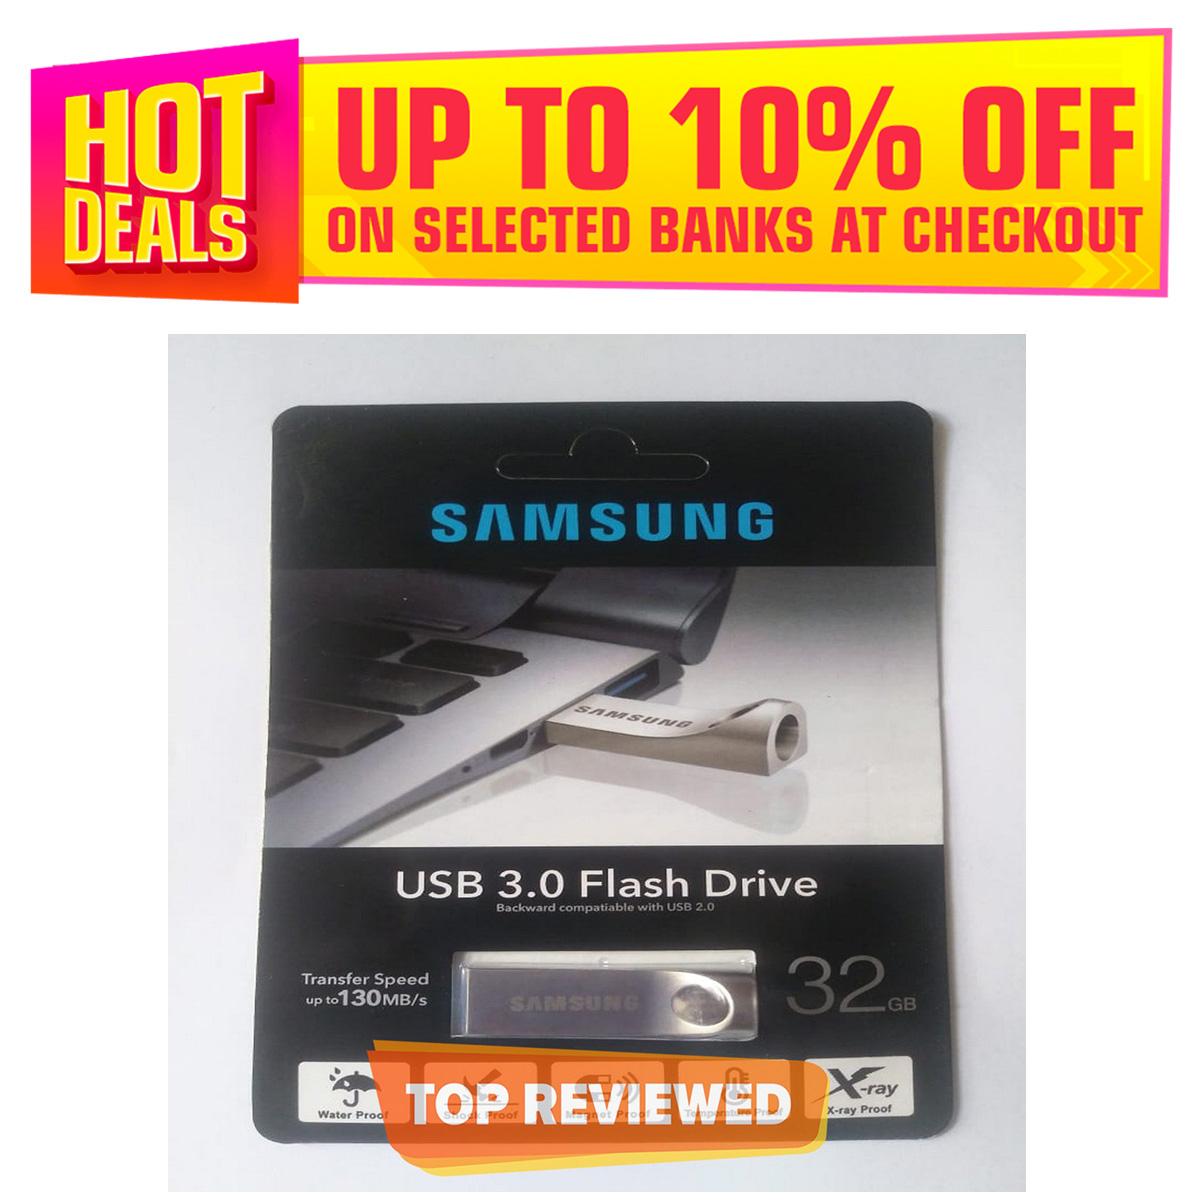 32 GB USB, High Speed 3.0 Flash Drive 32GB USB - 6-Months WARRANTY